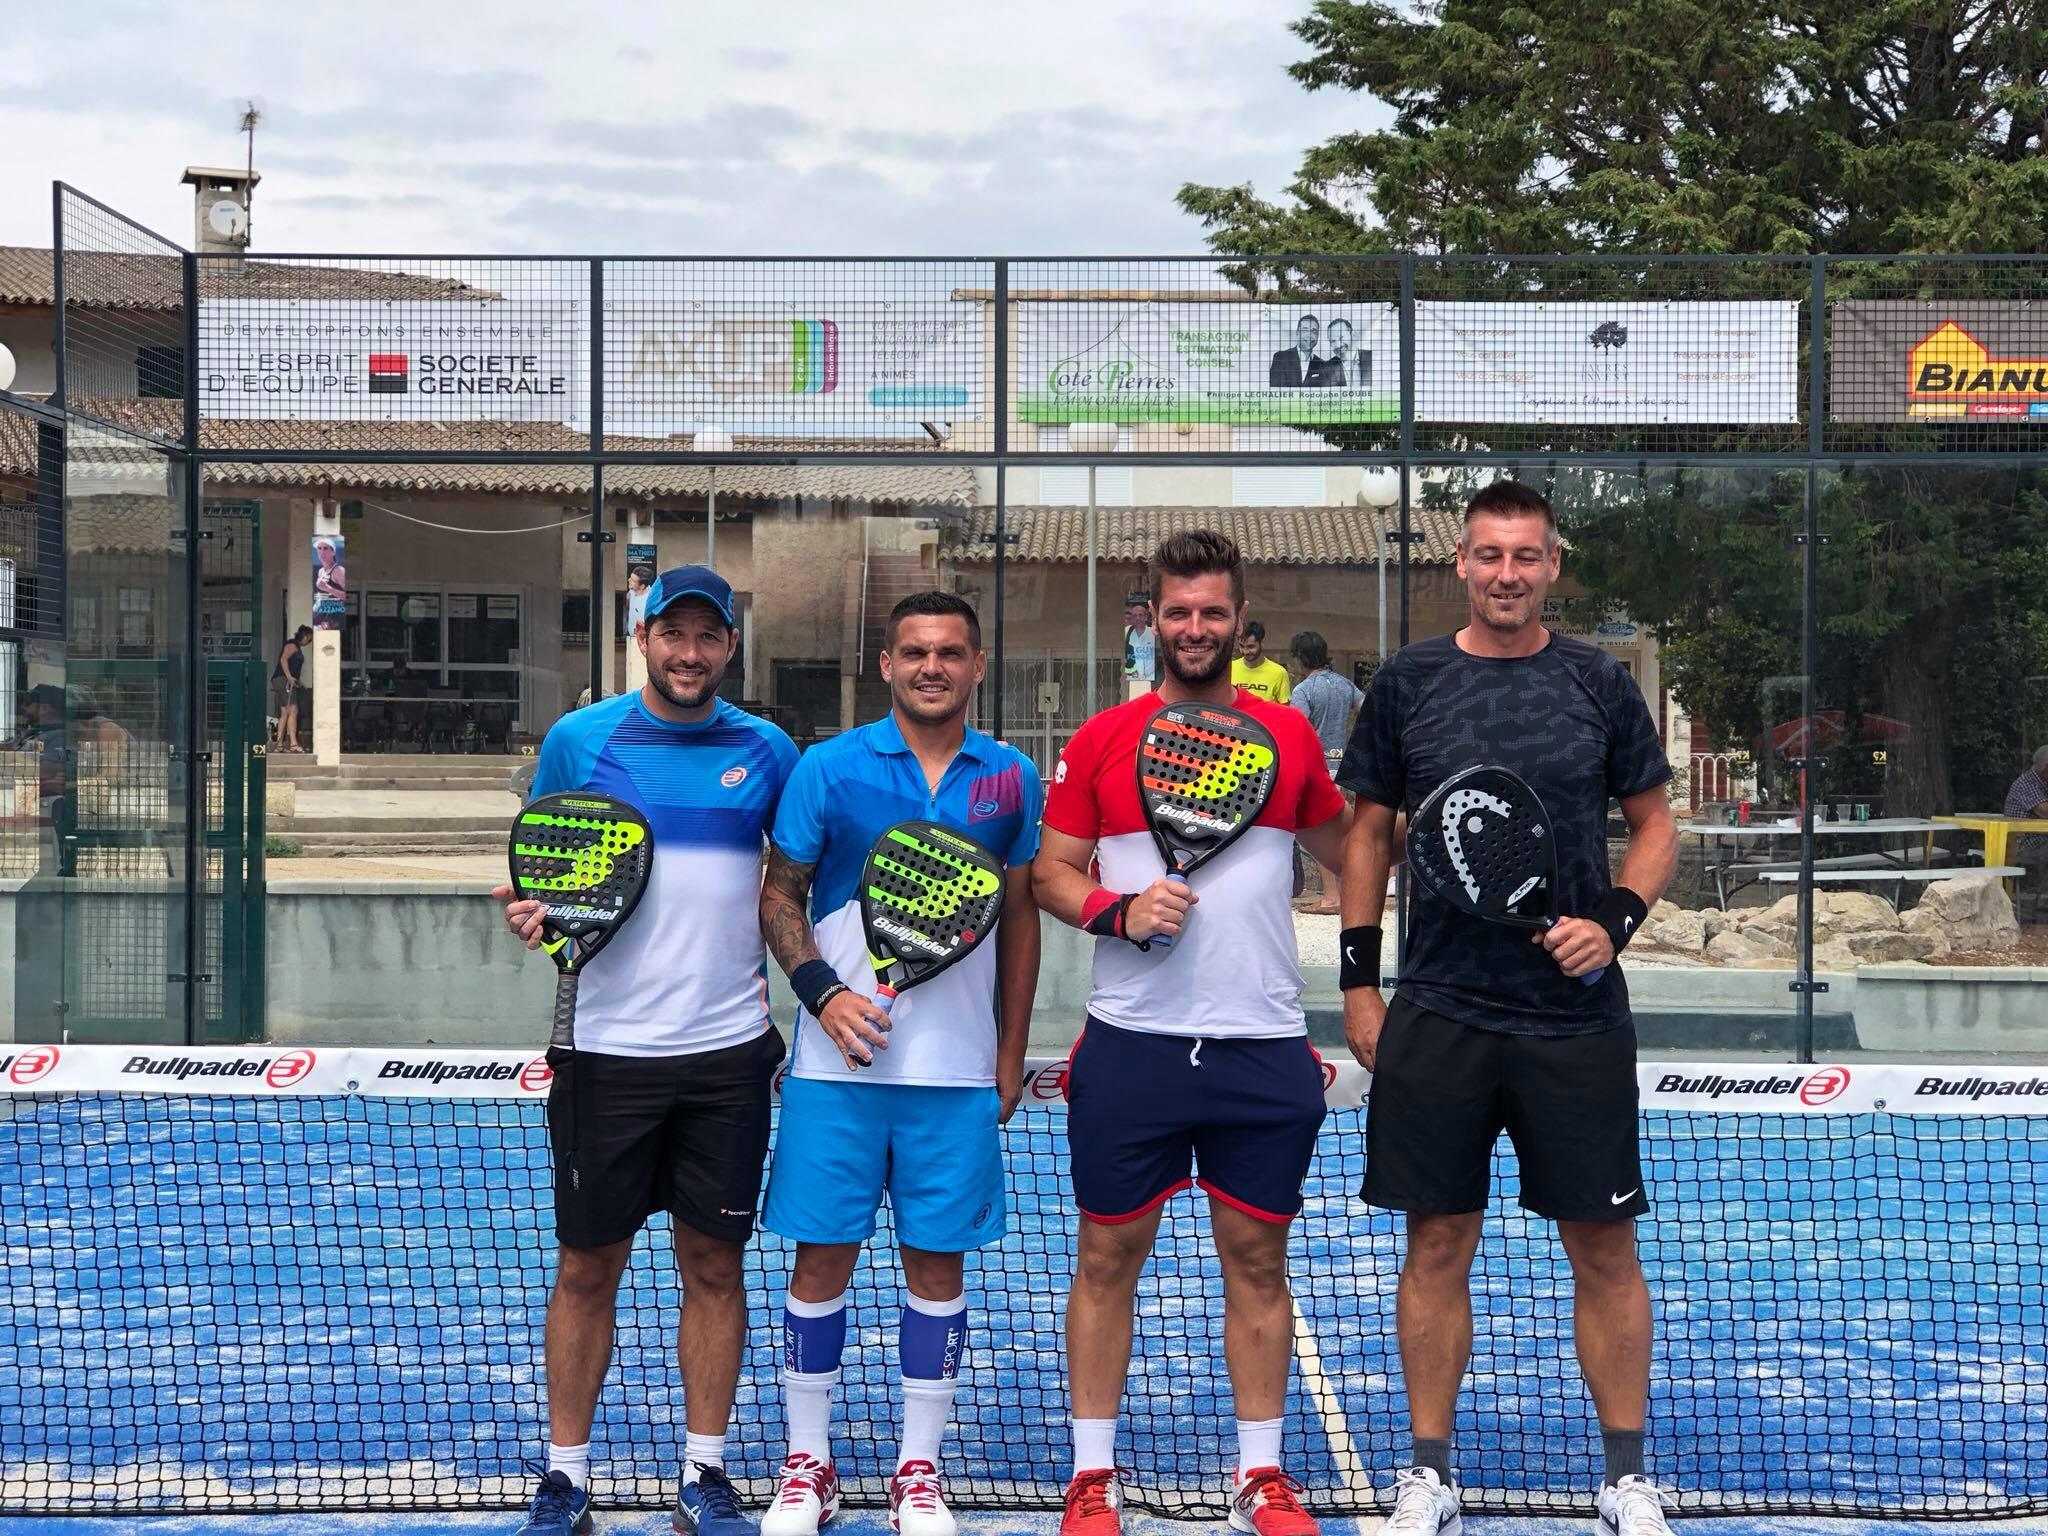 Pottier / Valsot remporte l'HDN Padel club